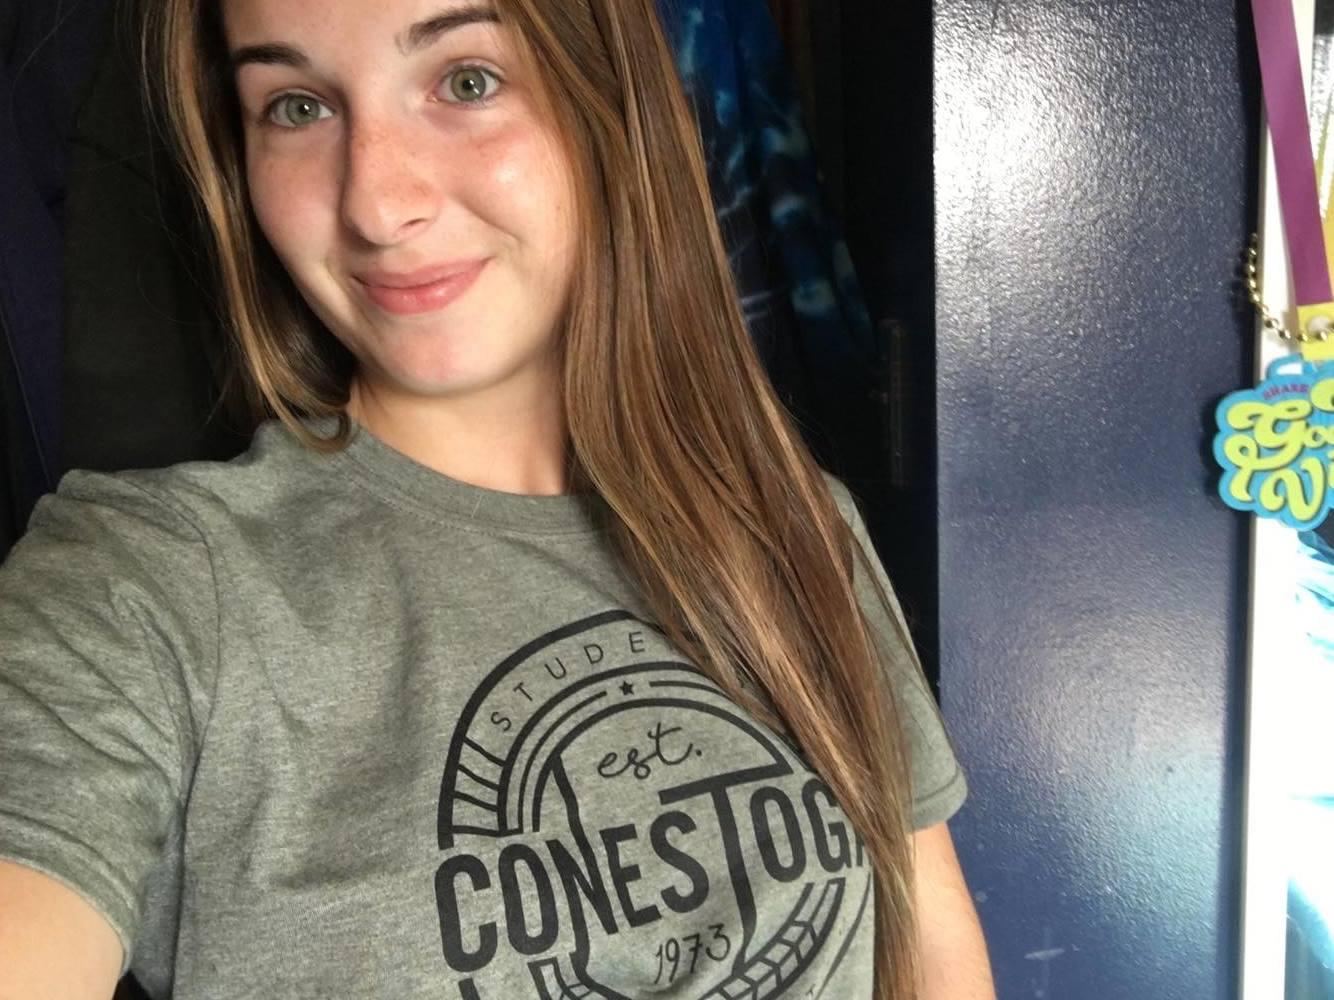 CSI Shirt Photo